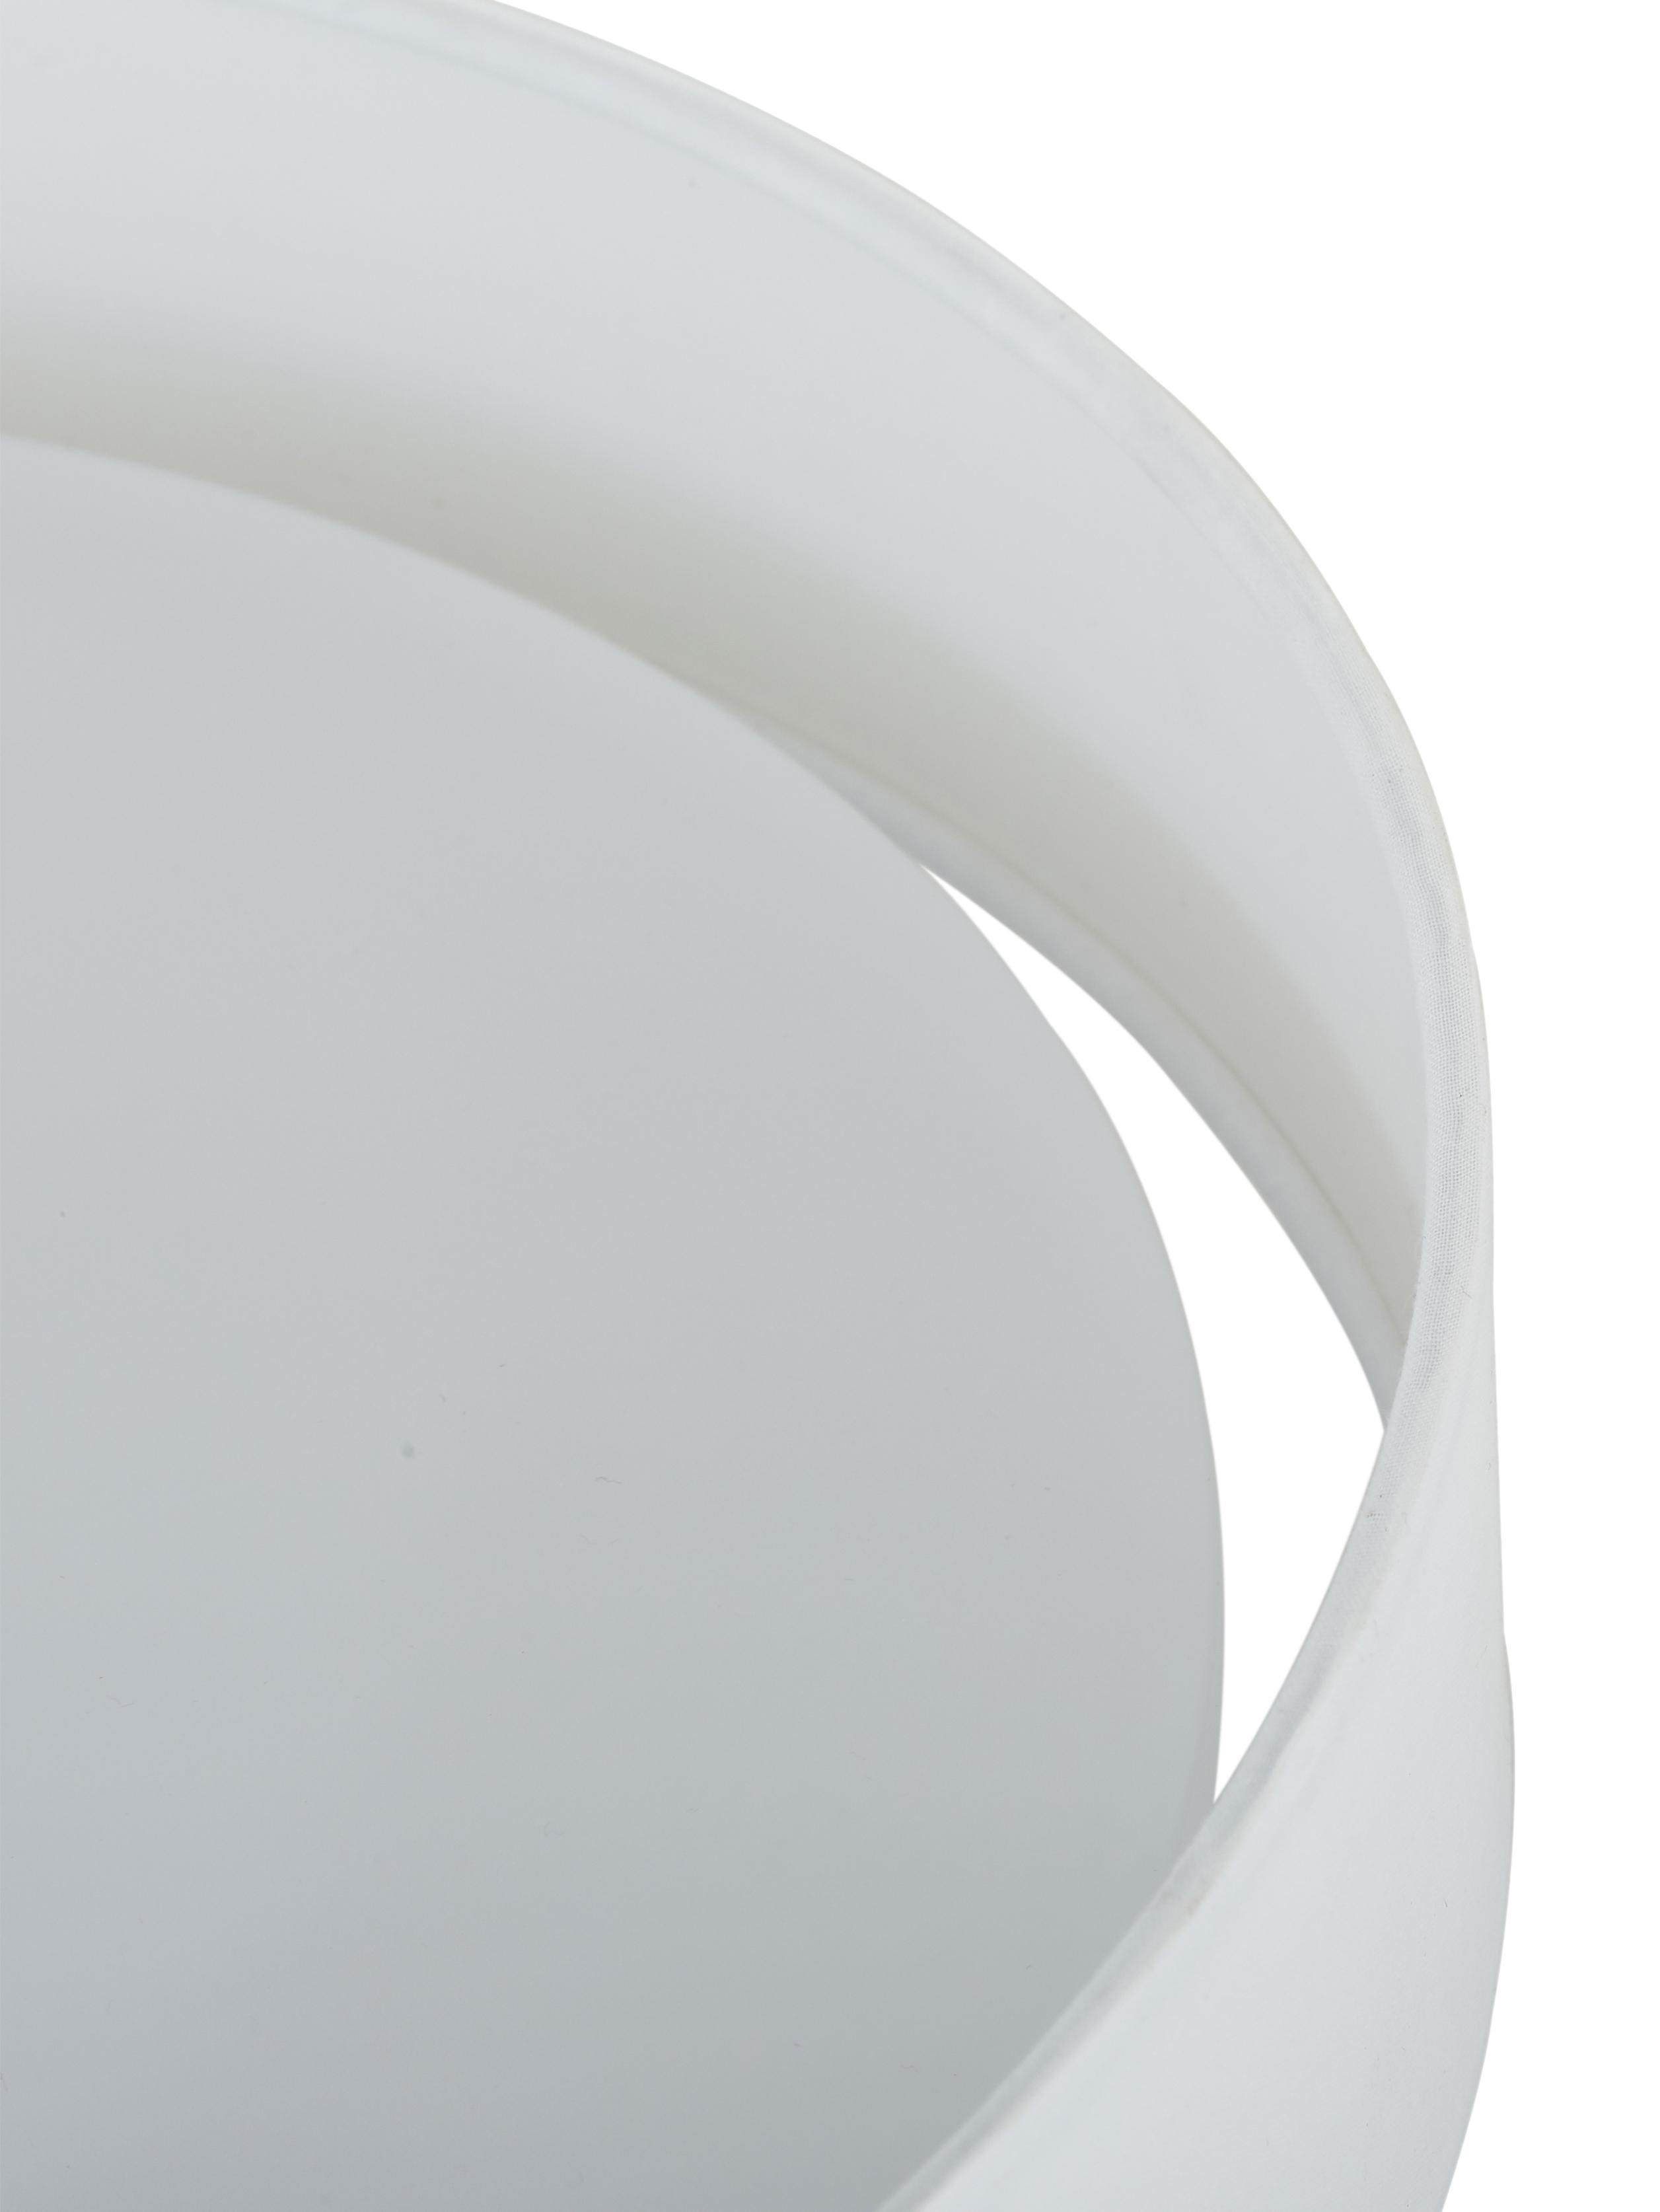 Plafoniera a LED Helen, Struttura: metallo, Bianco, Ø 52 x Alt. 11 cm